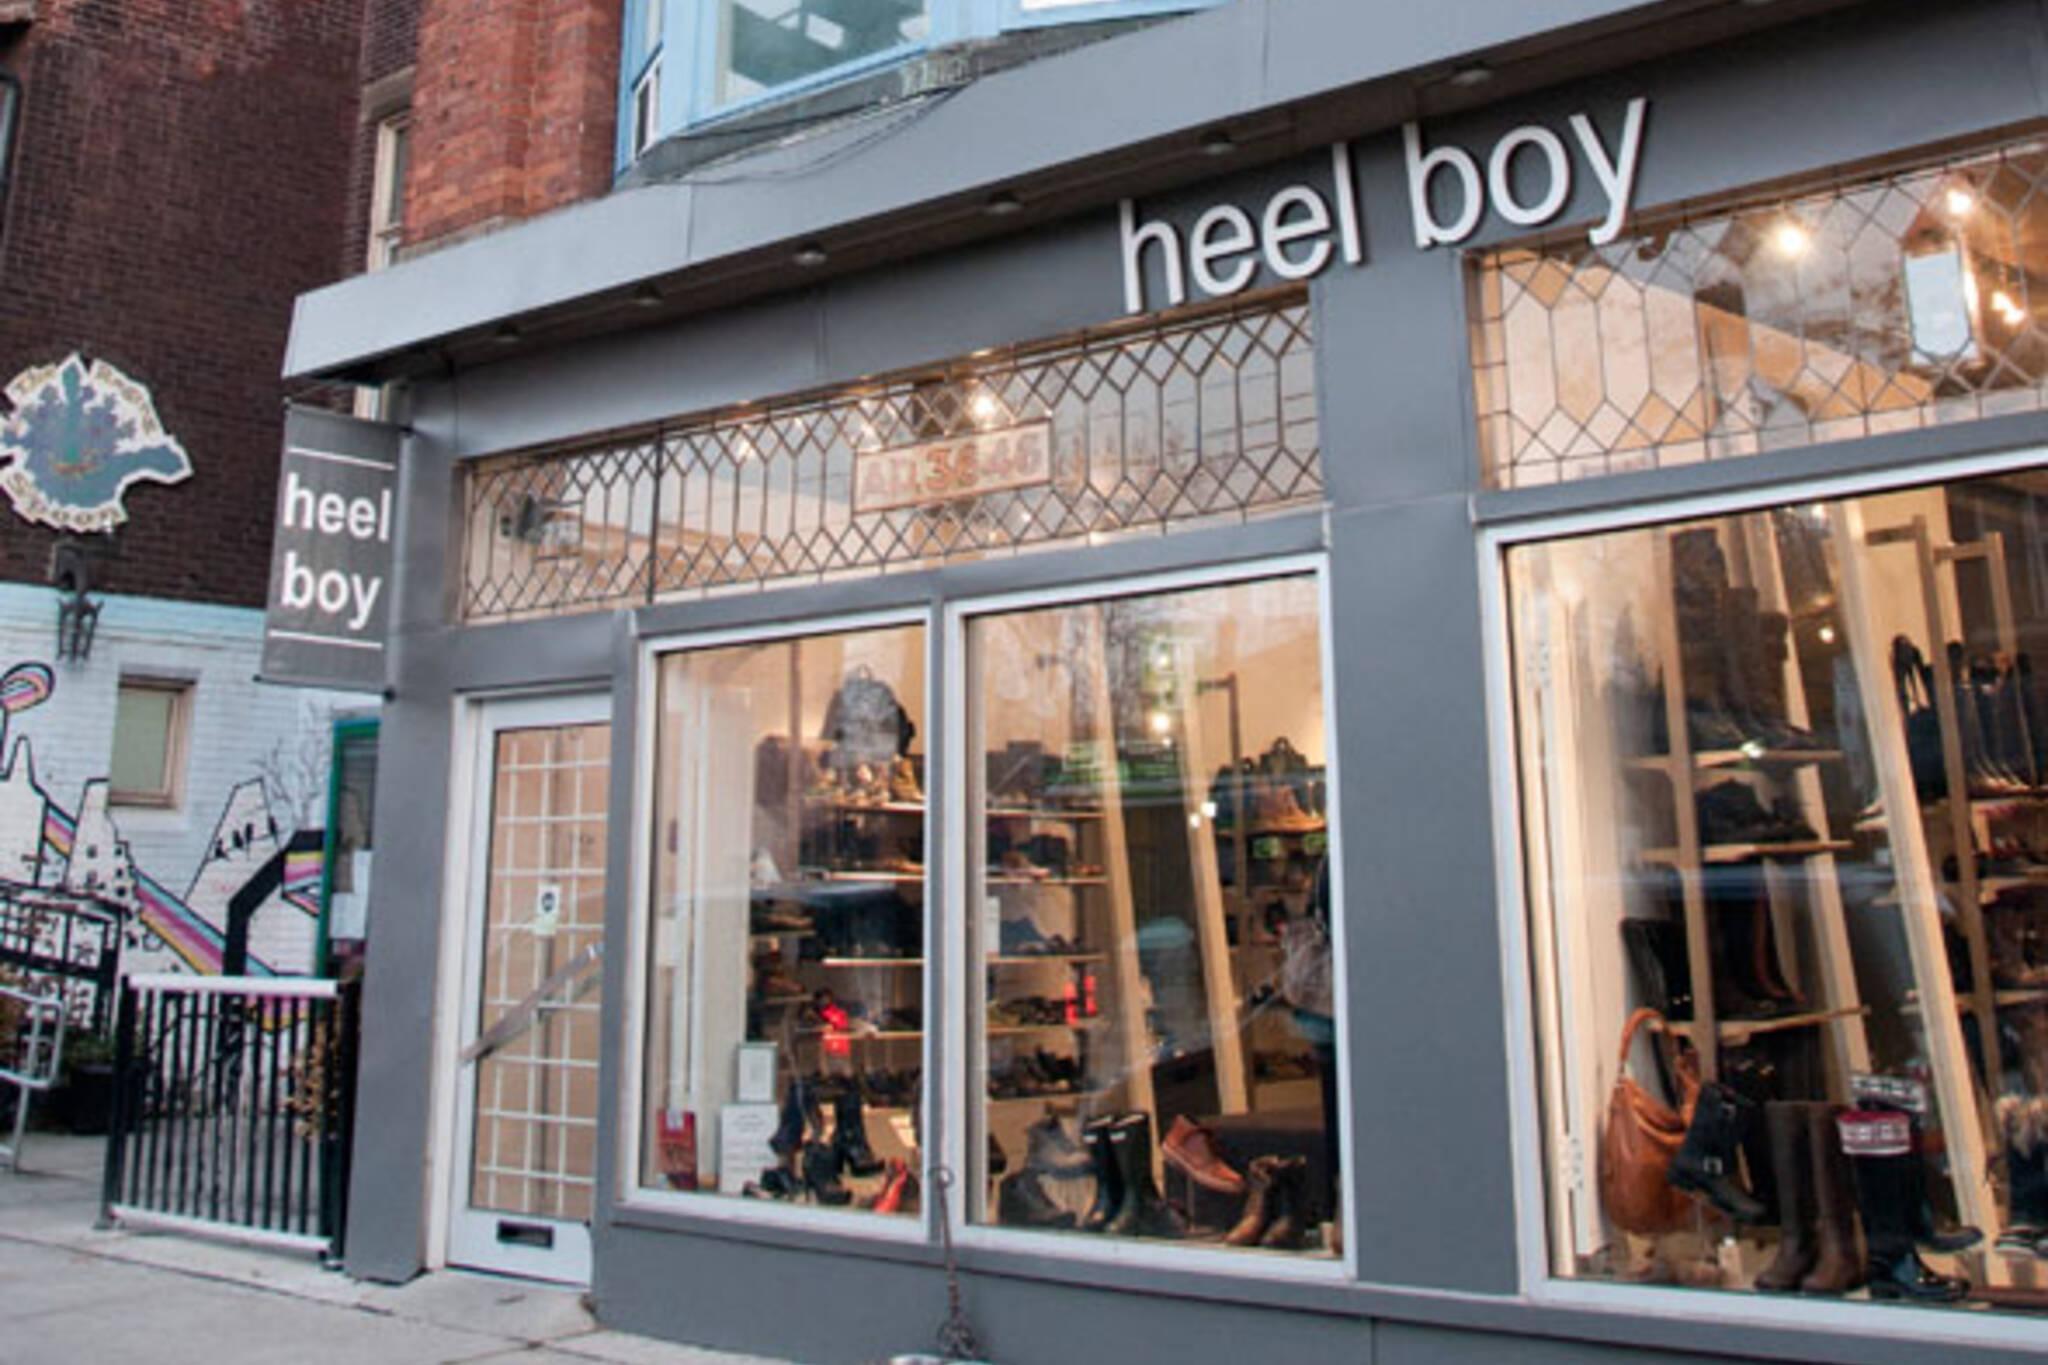 Heel boy Toronto